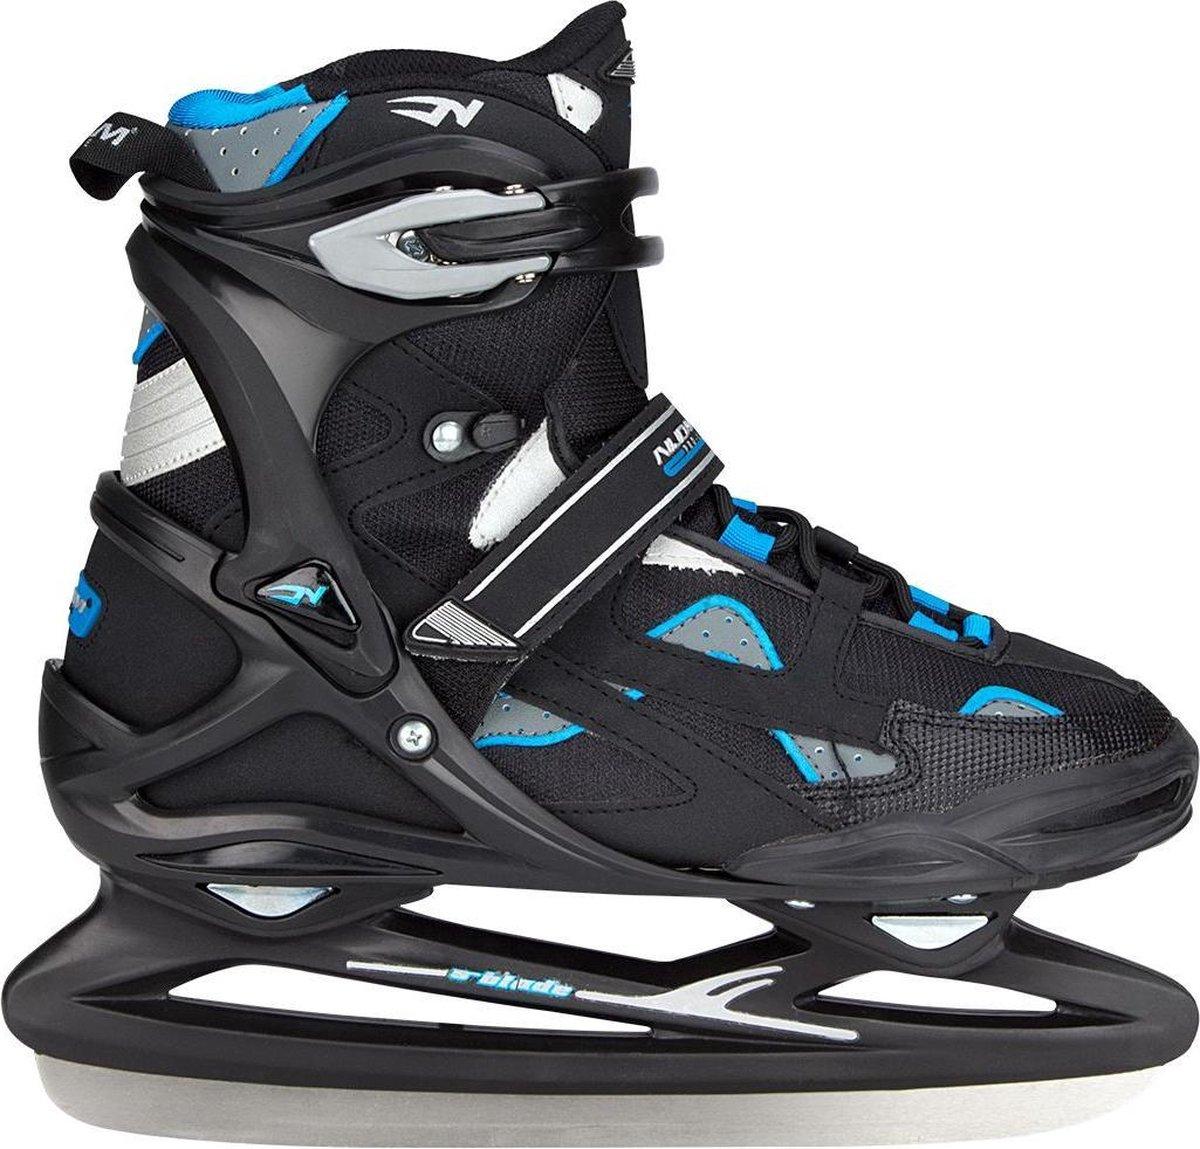 Nijdam IJshockeyschaats Pro-Line - Semi-Softboot - Zwart/Antraciet/Blauw - 45